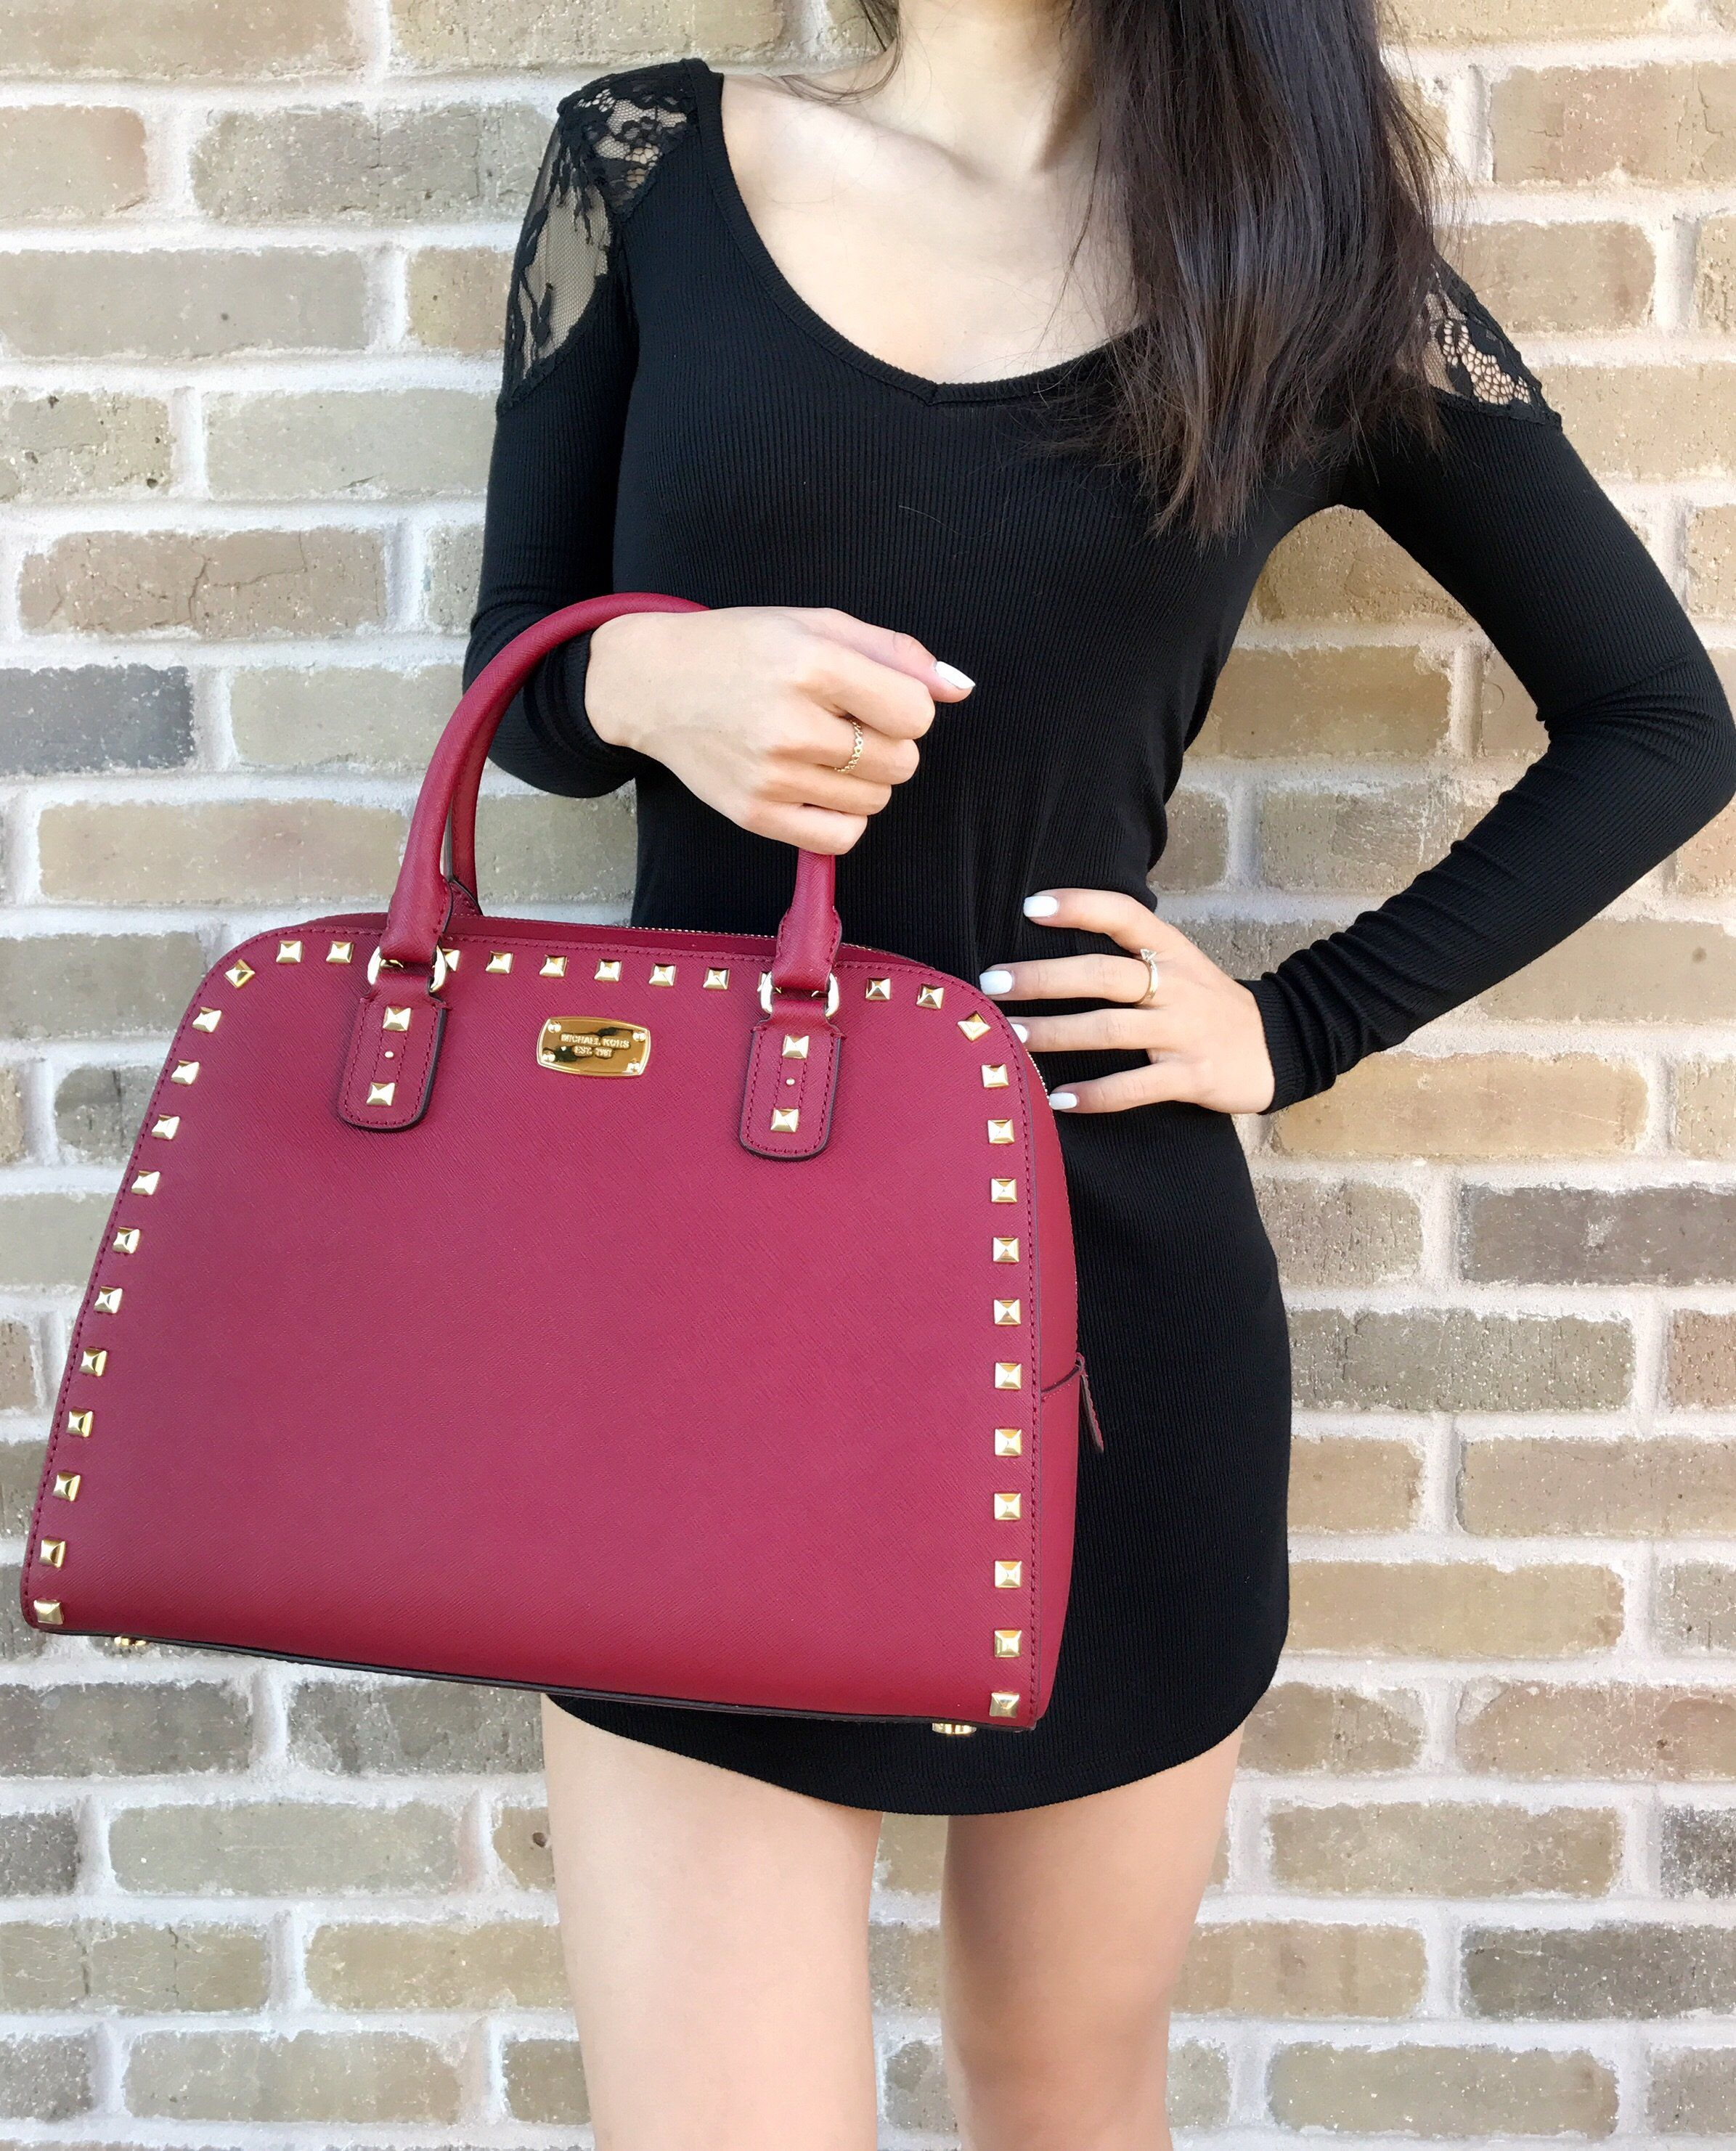 67bea0c5707a Michael Kors Sandrine Stud Leather Large Satchel Crossbody Handbag Cherry  Red  ebayreseller  ebayfashion  mercariseller  poshpackages  amazondeals ...